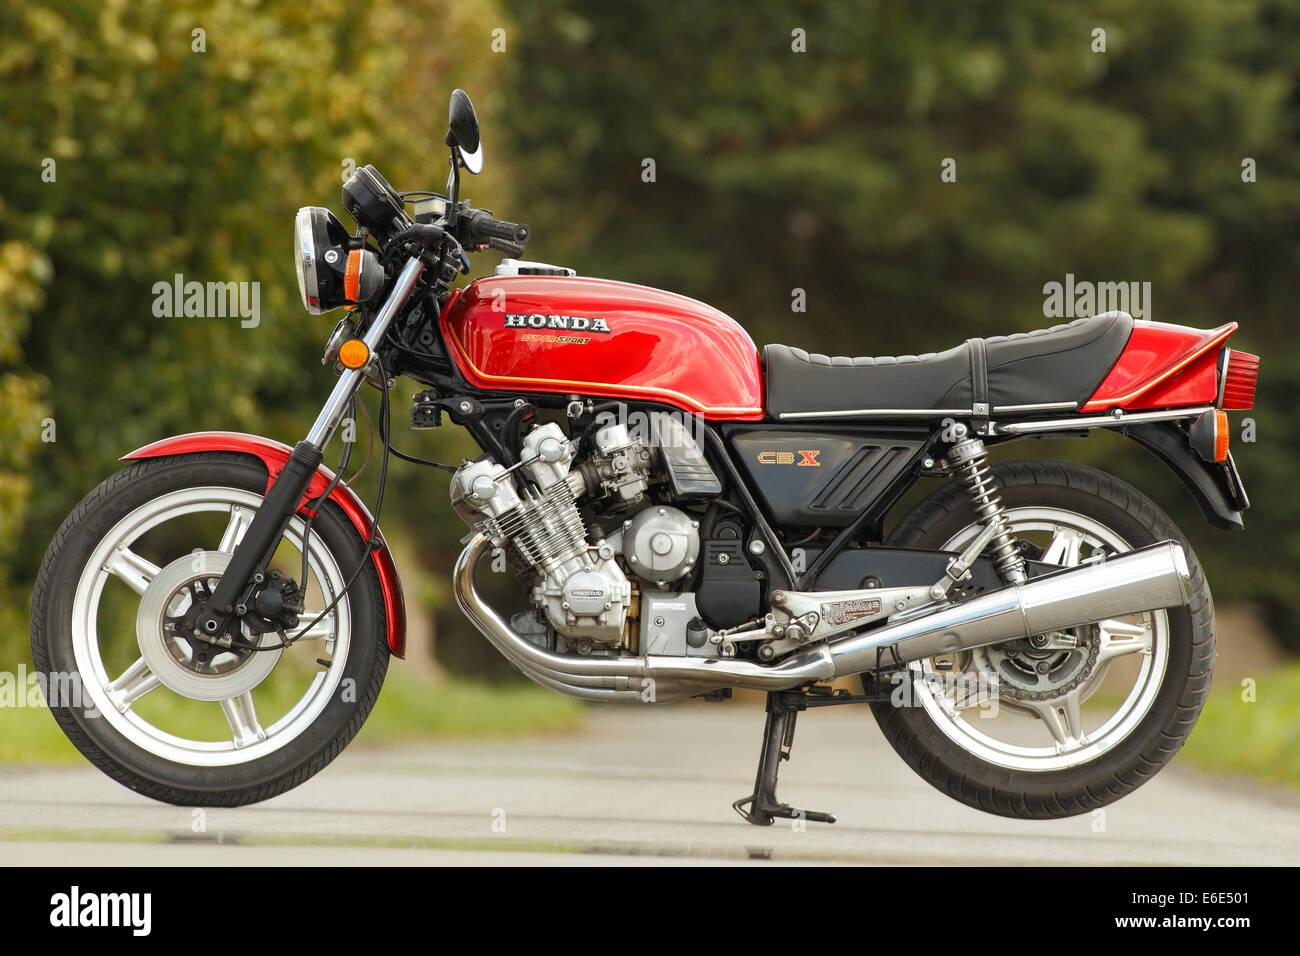 Motorcycle, Honda CBX Super Sport - Stock Image